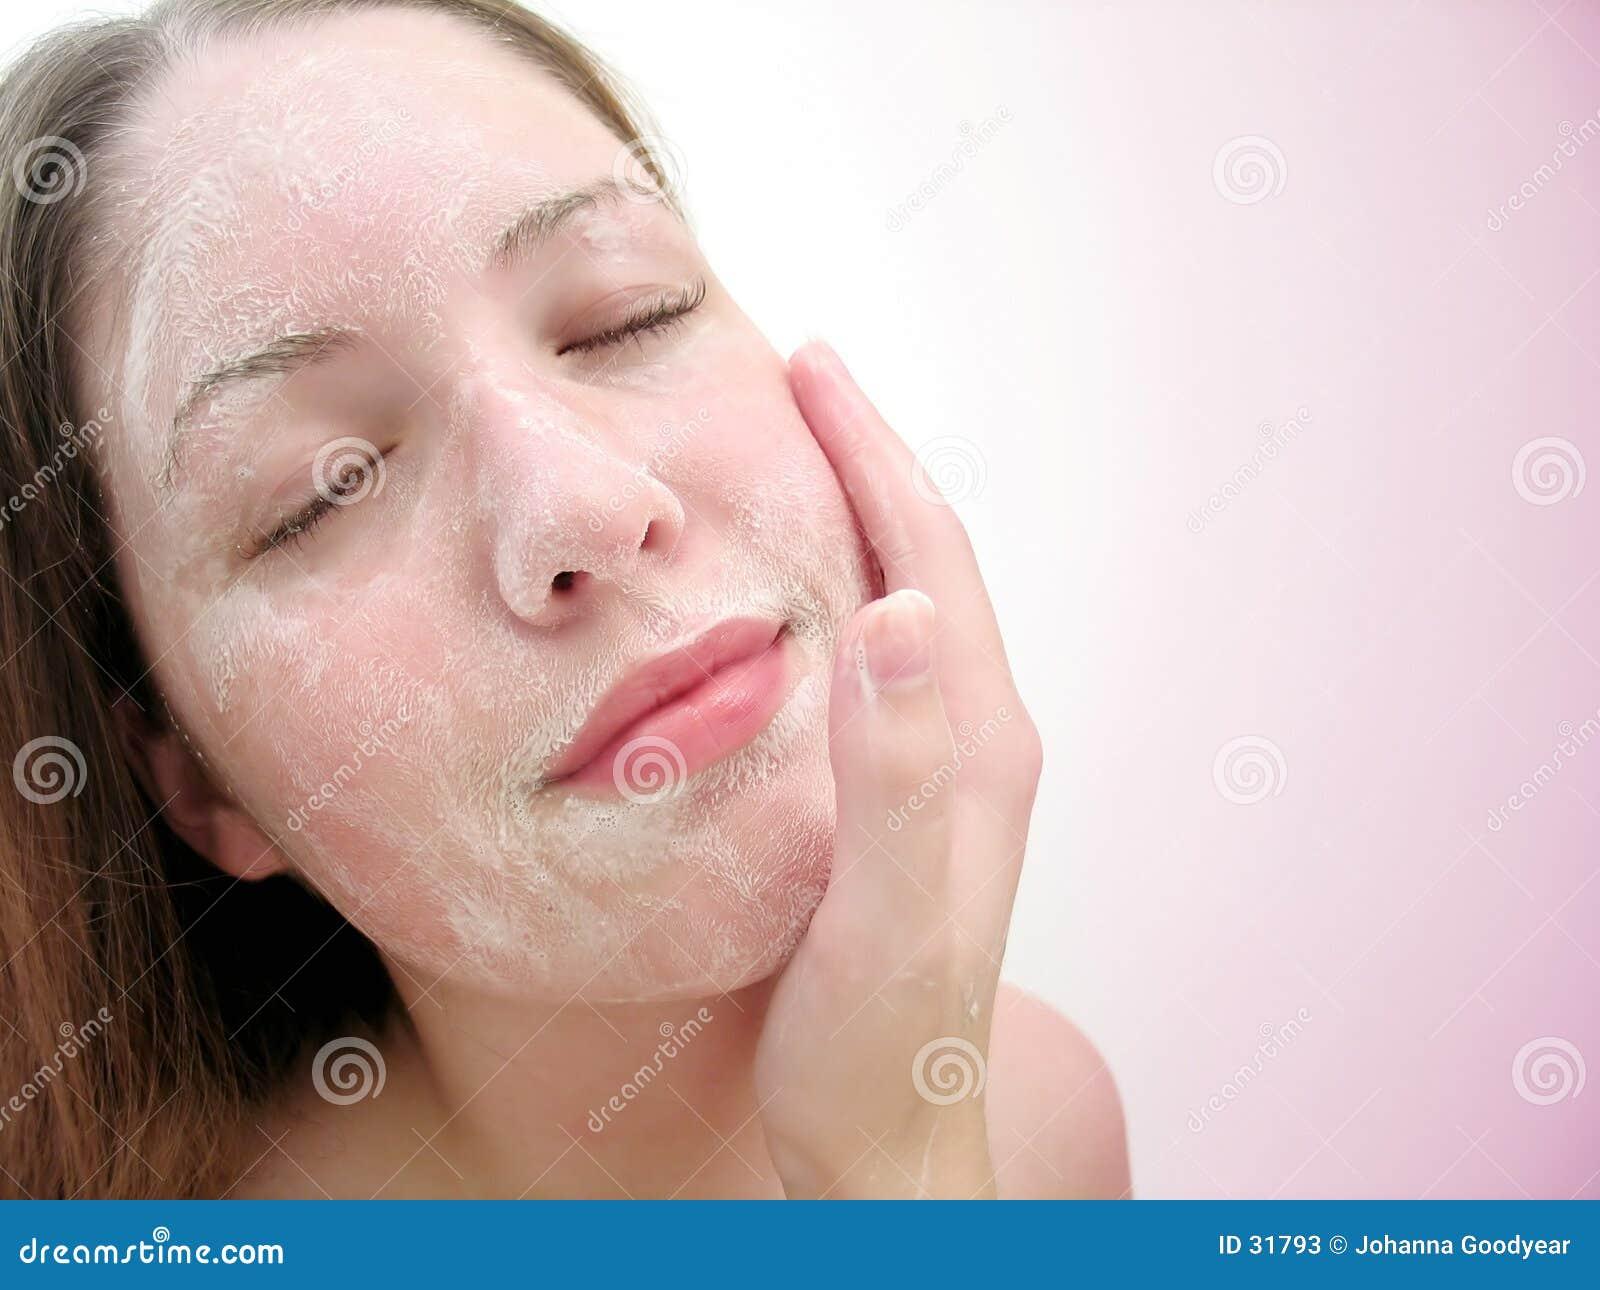 лицевое мытье 2